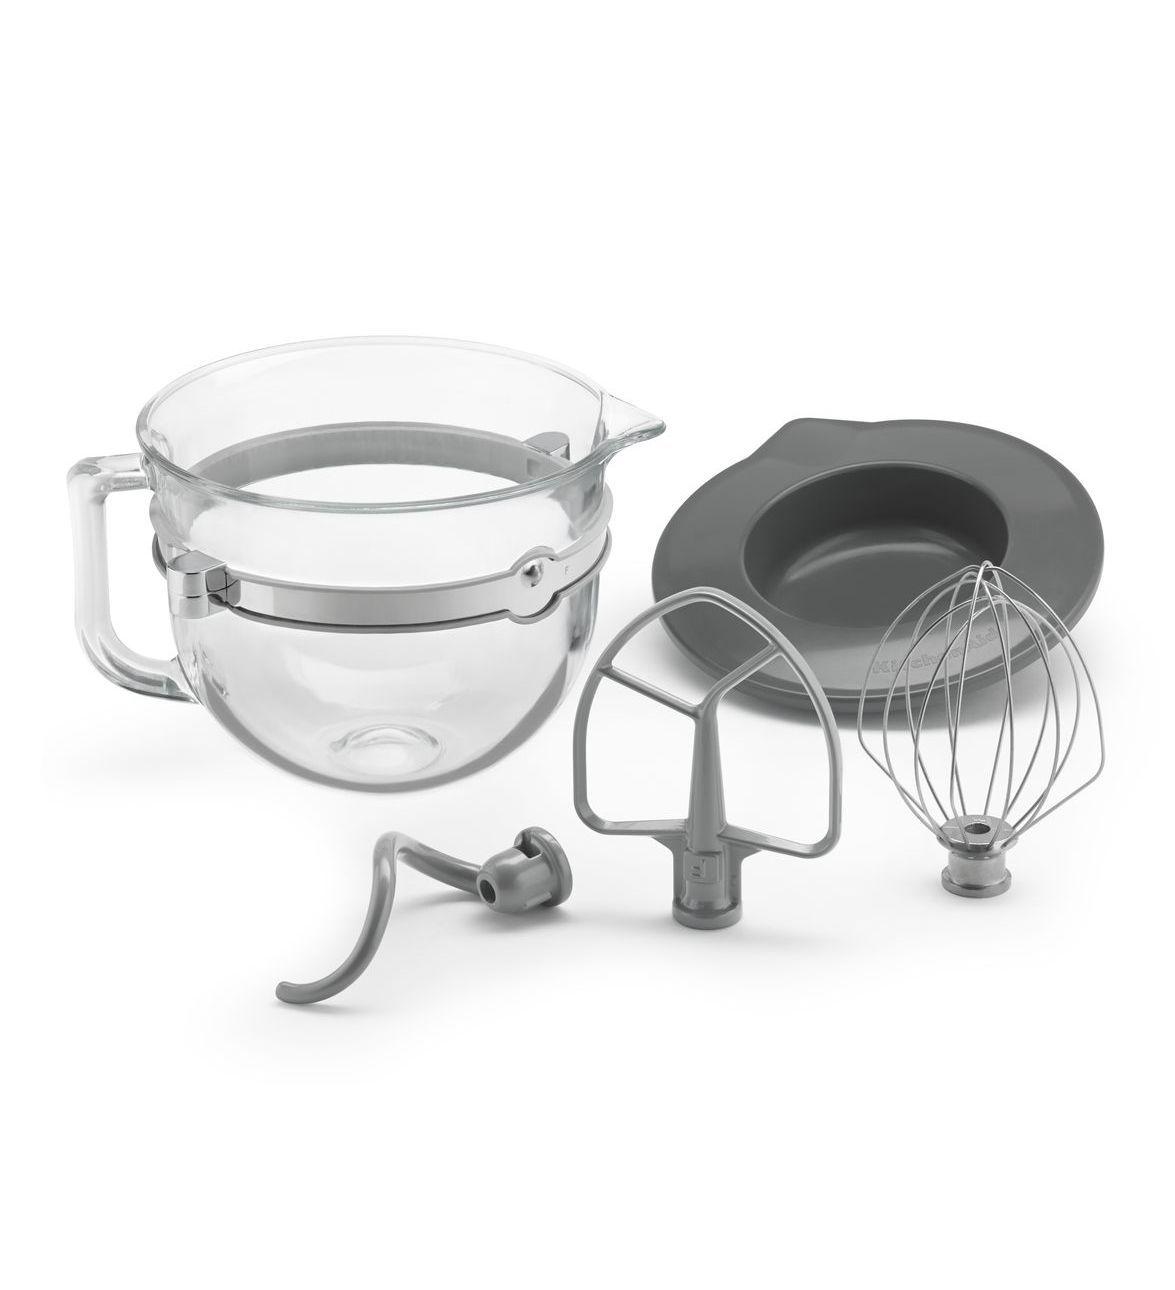 kitchenaid replacement bowl lift